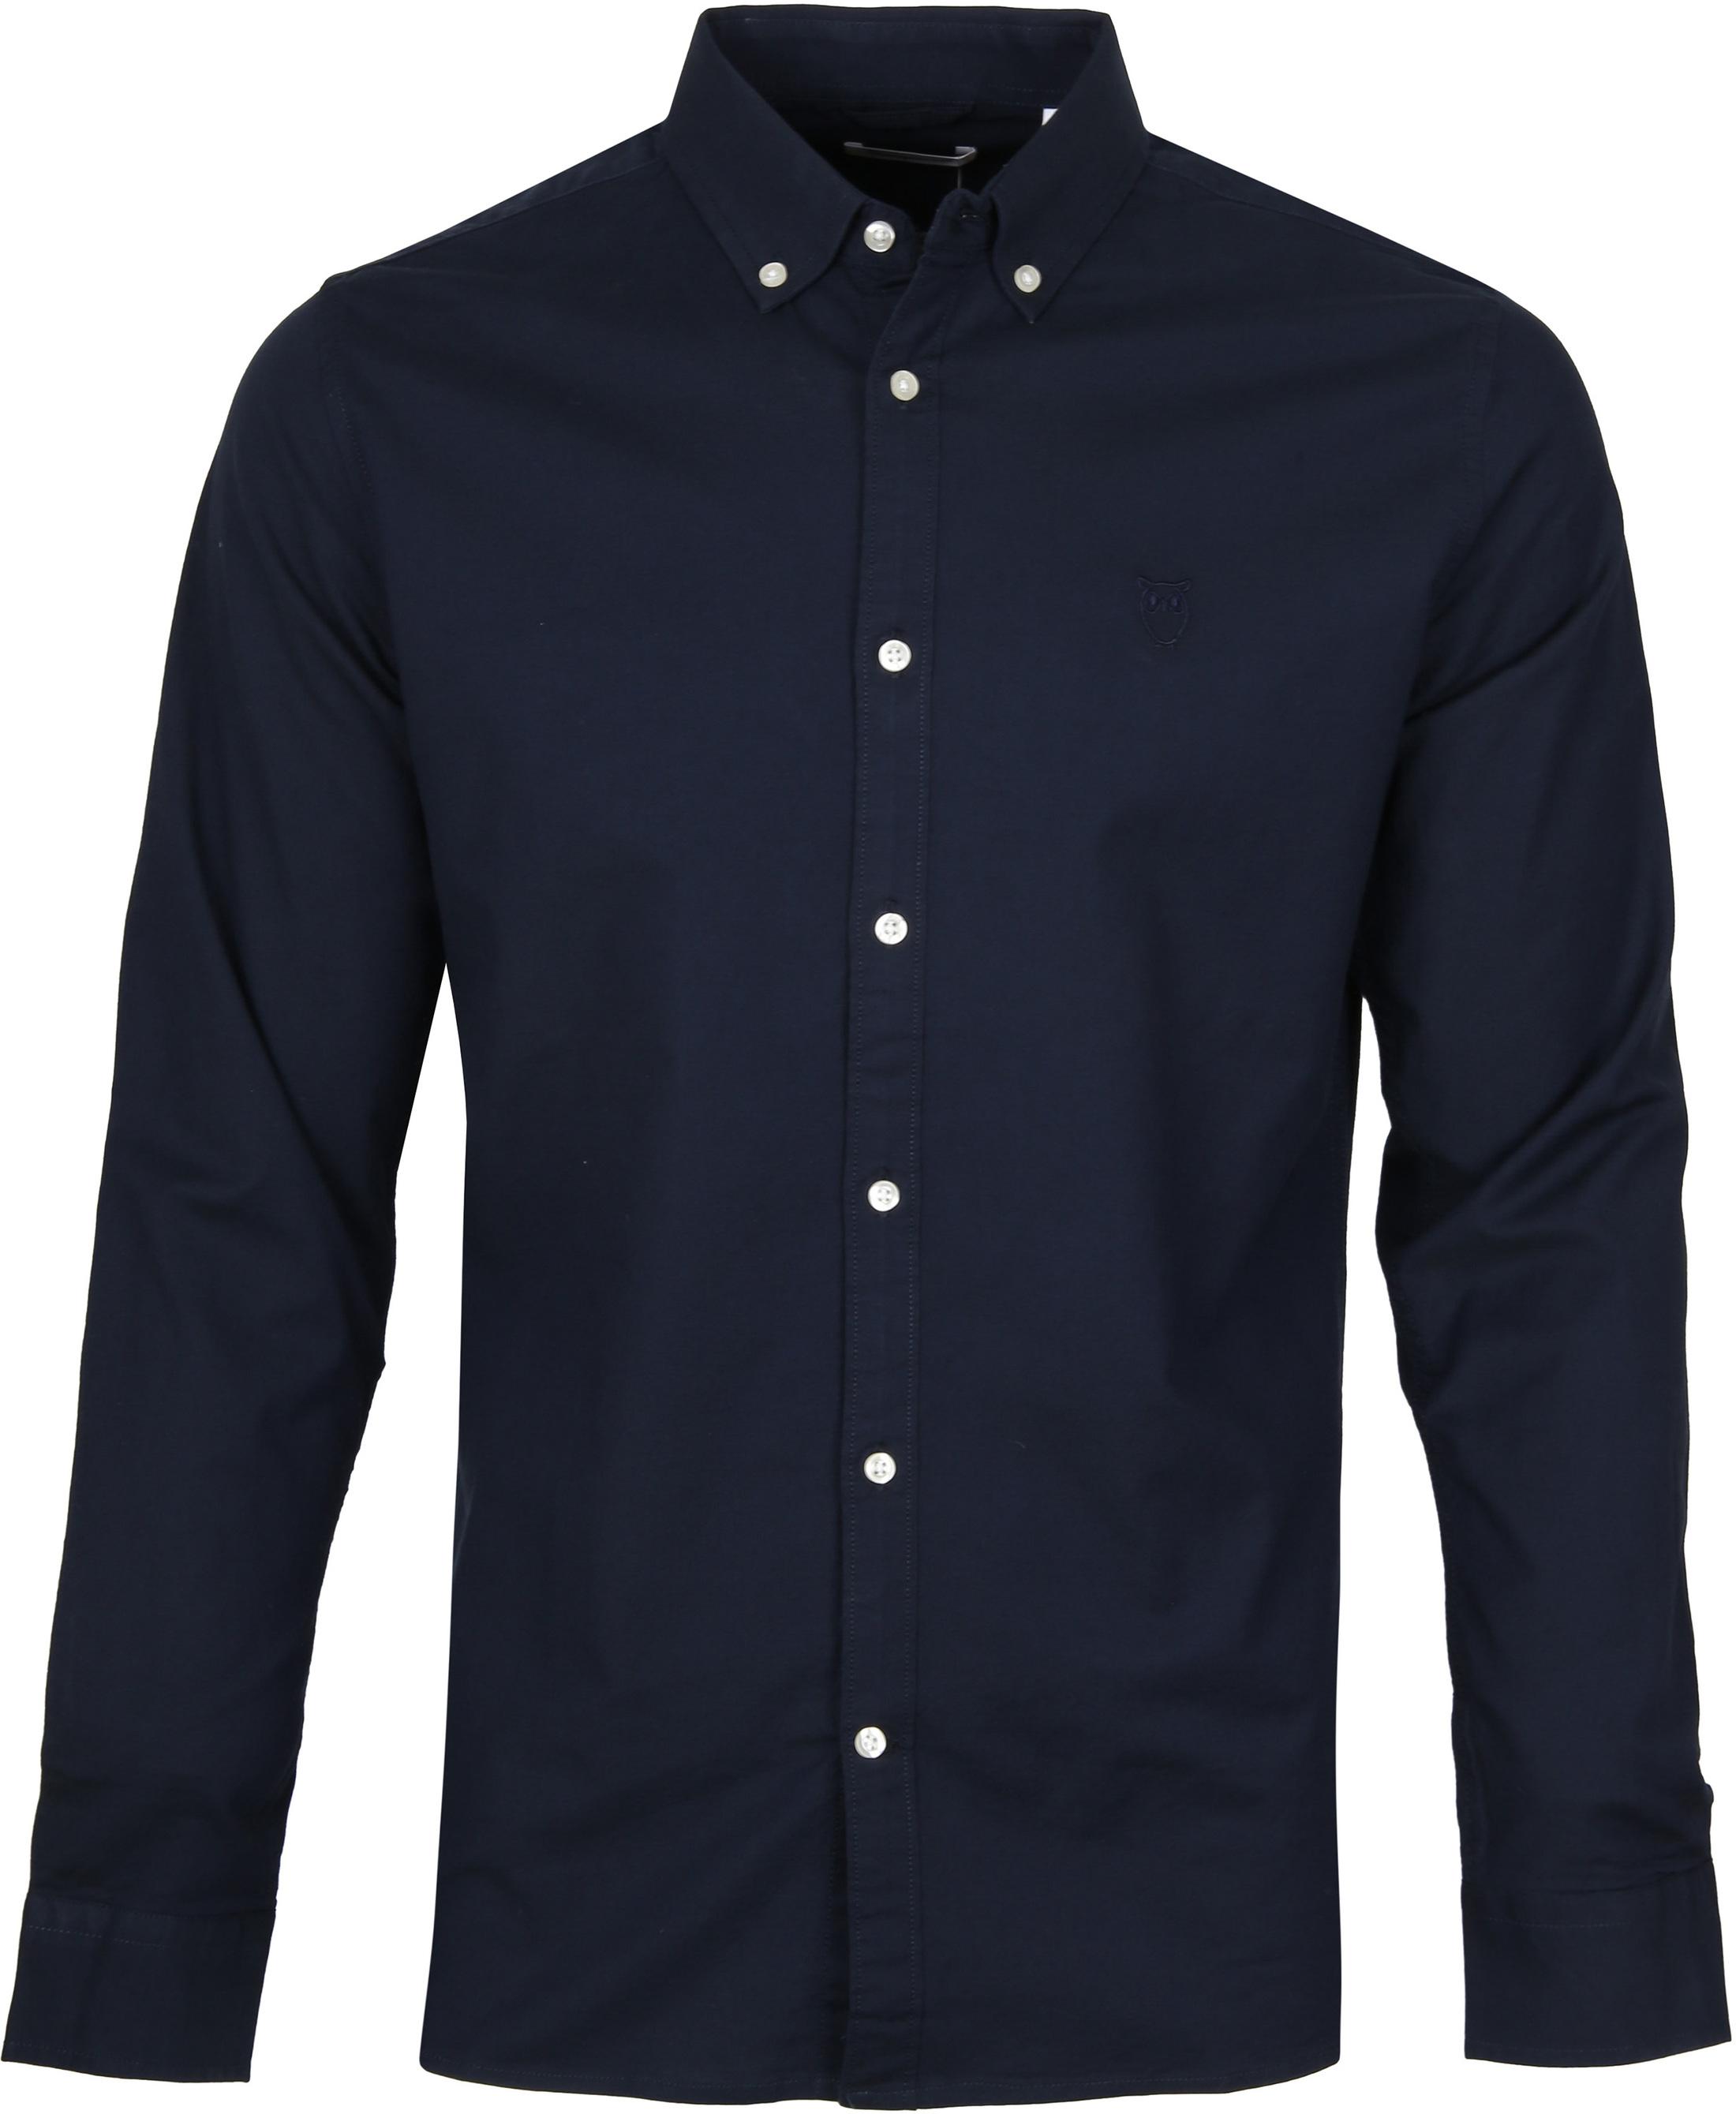 KnowledgeCotton Apparel Navy Overhemd